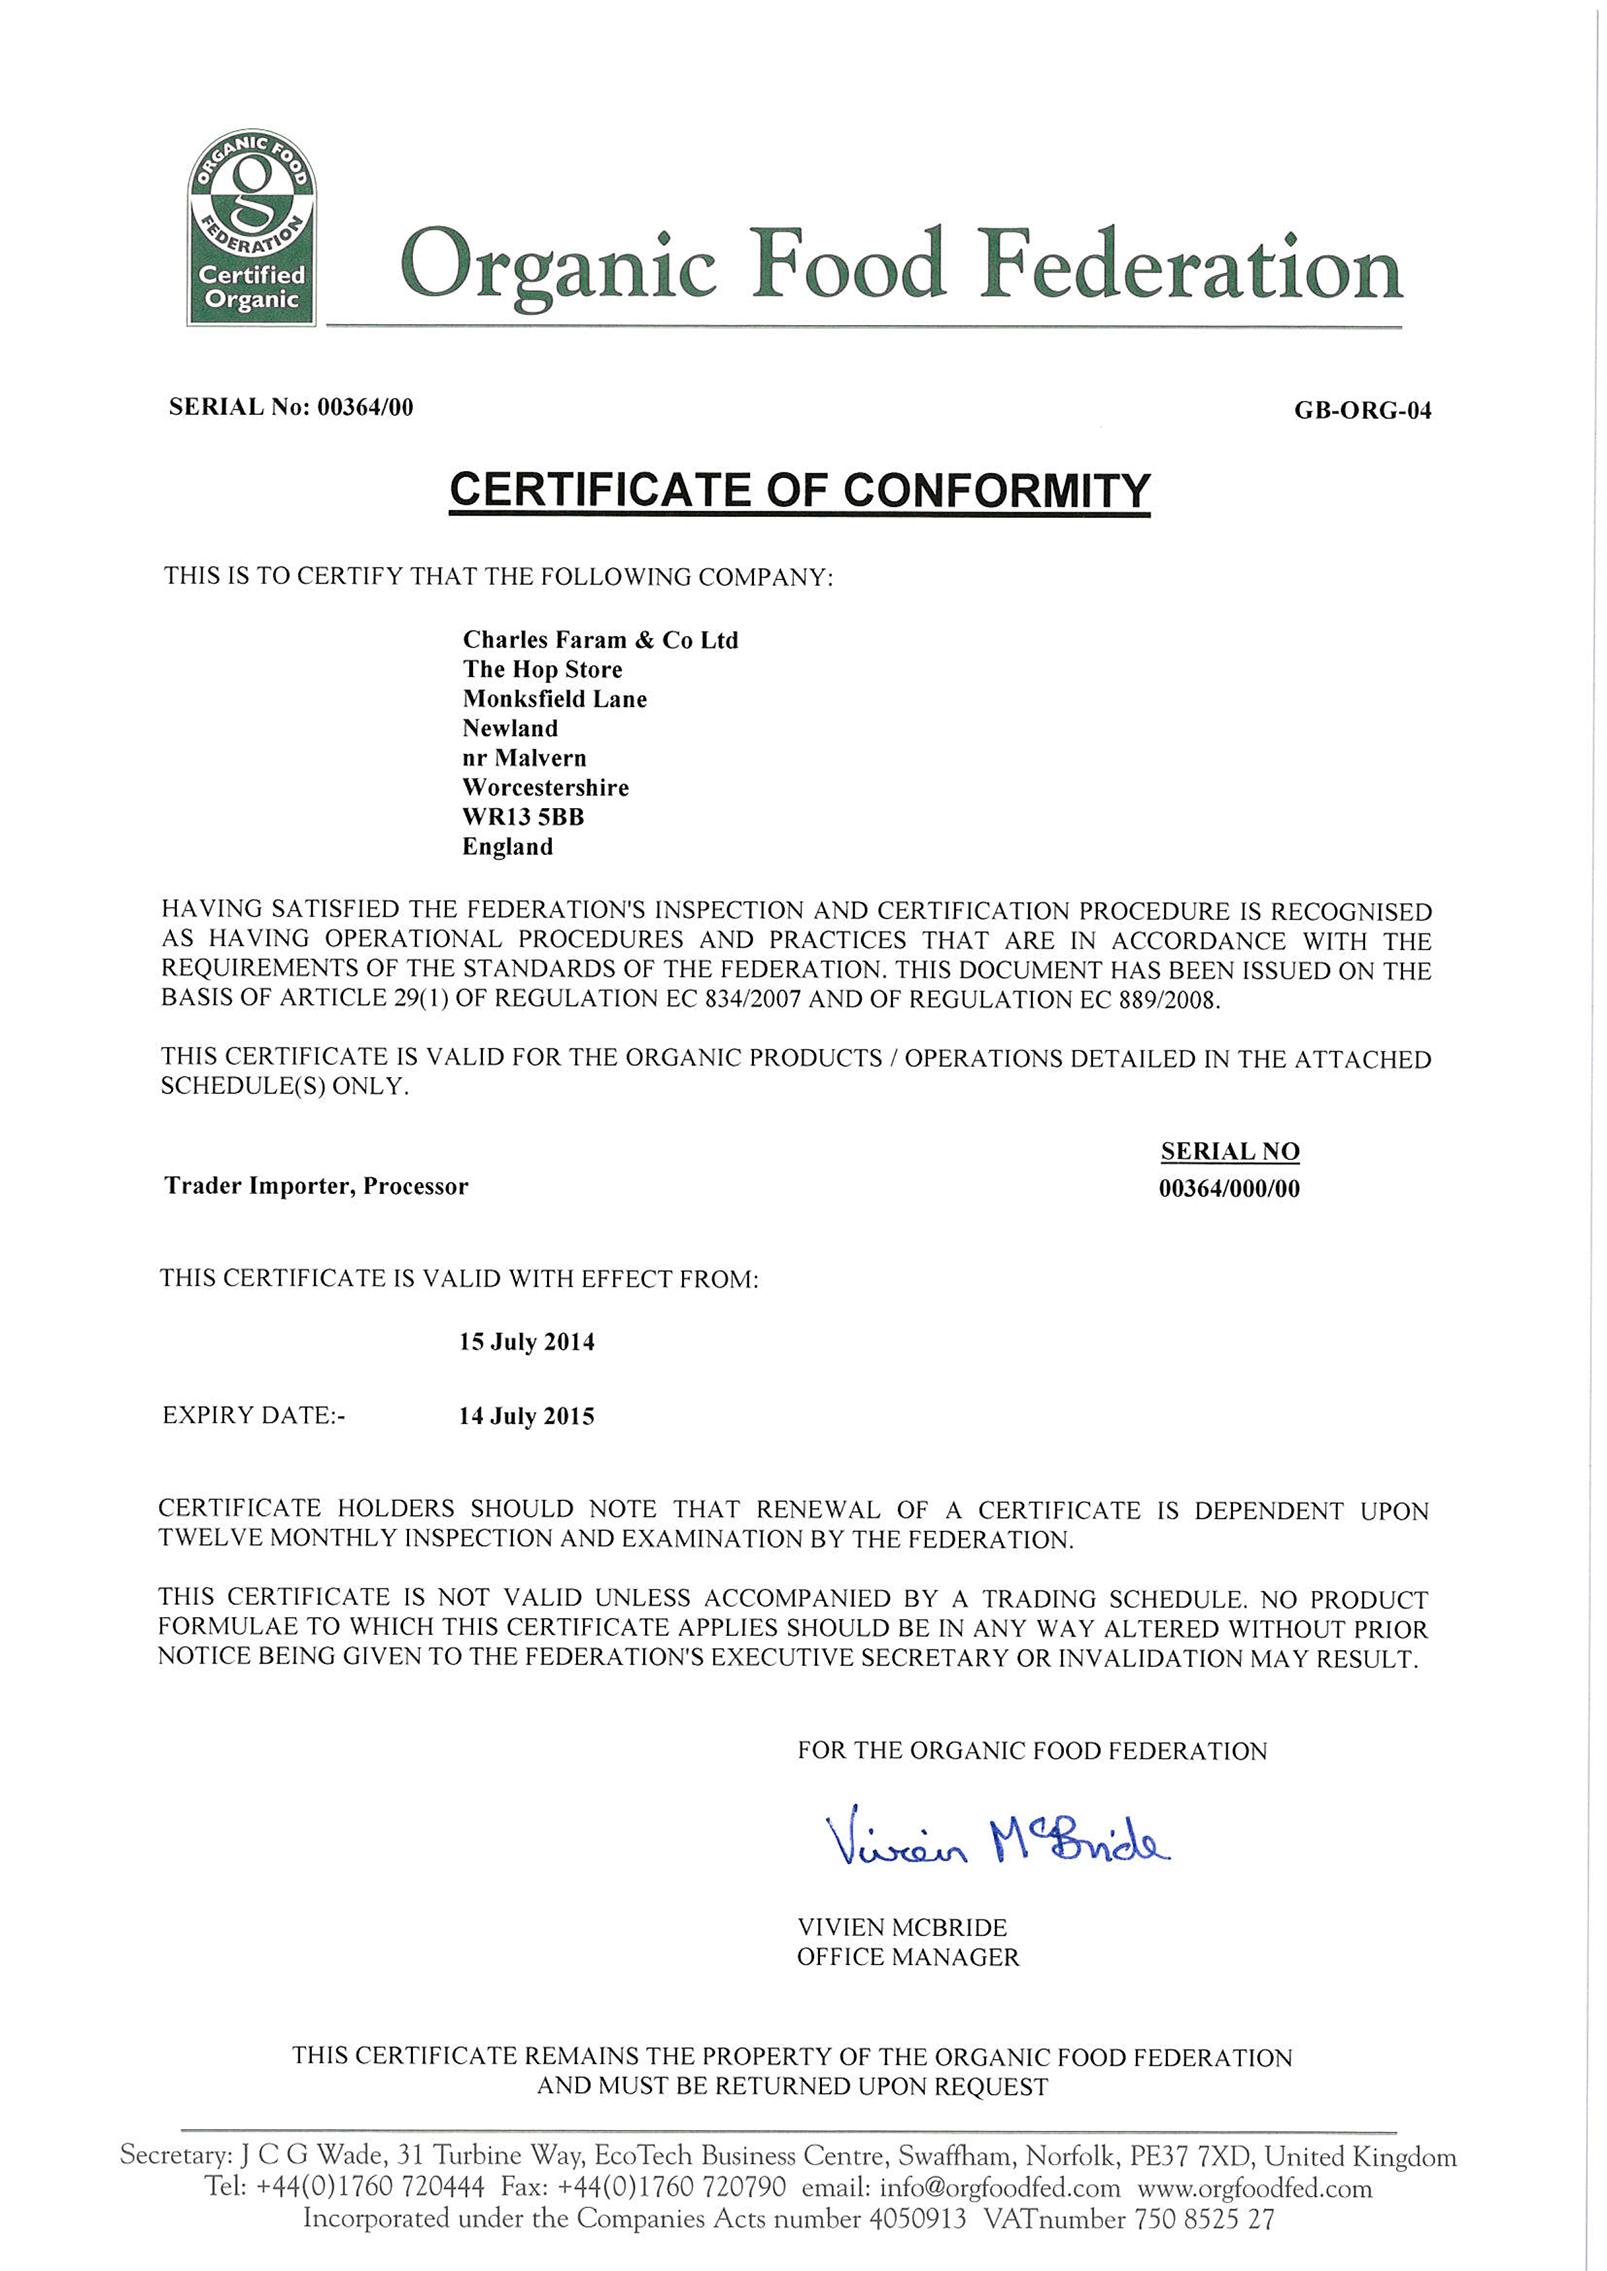 CharlesFaramOrganicCertification2014-15.jpg